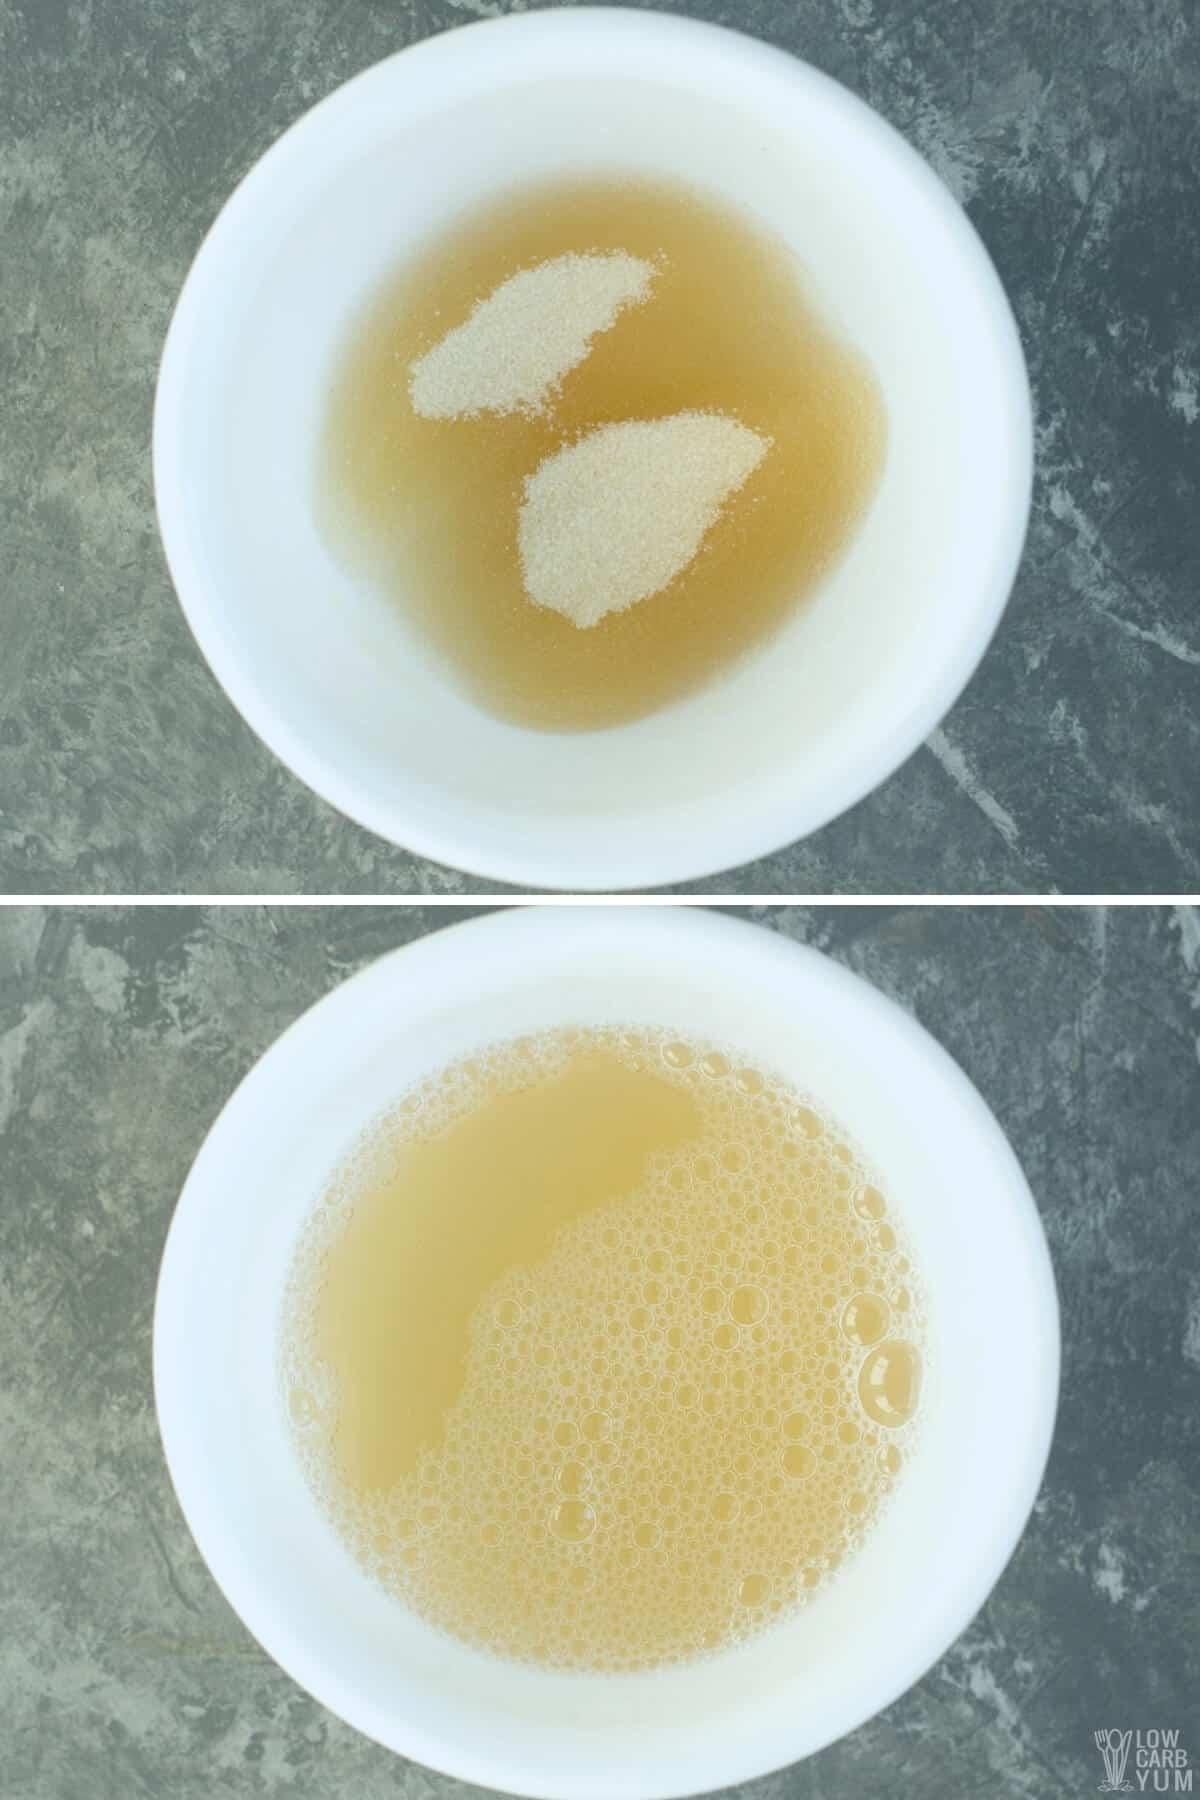 gelatin water mixture